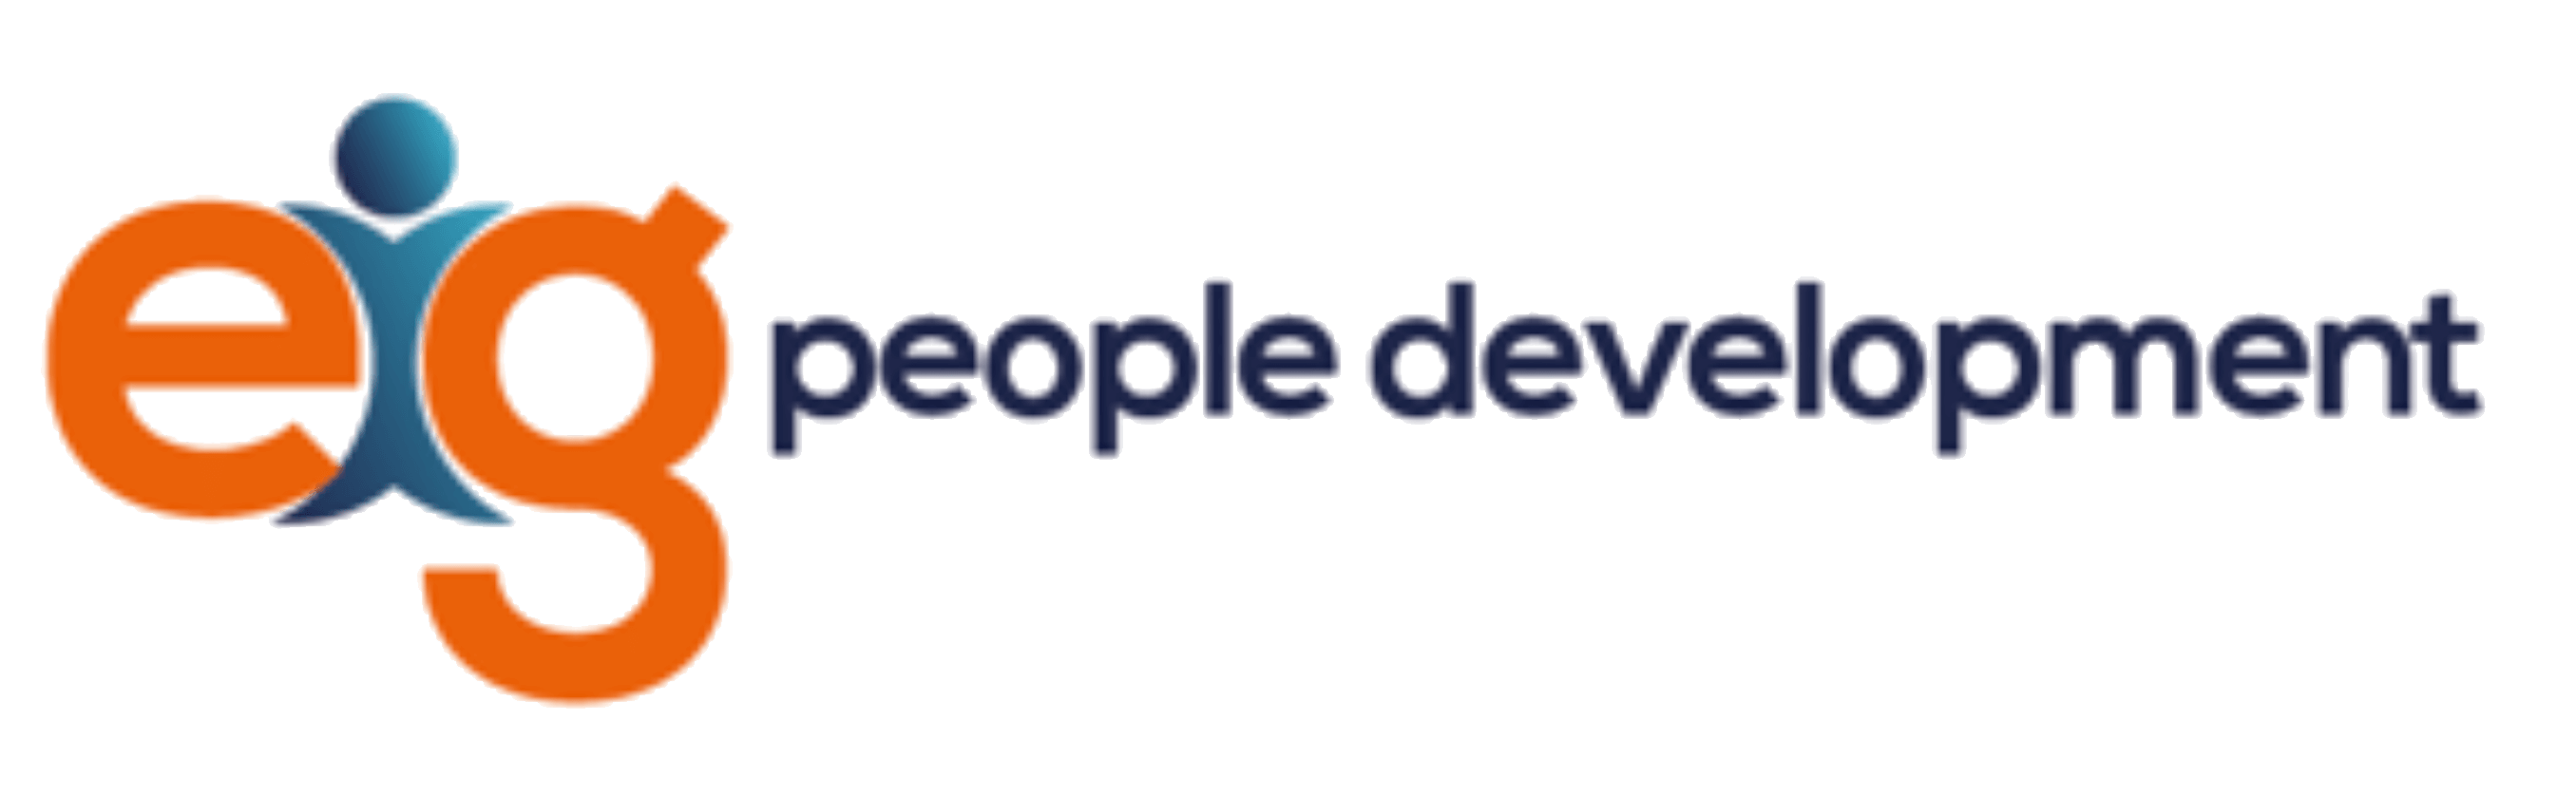 E.G People Development